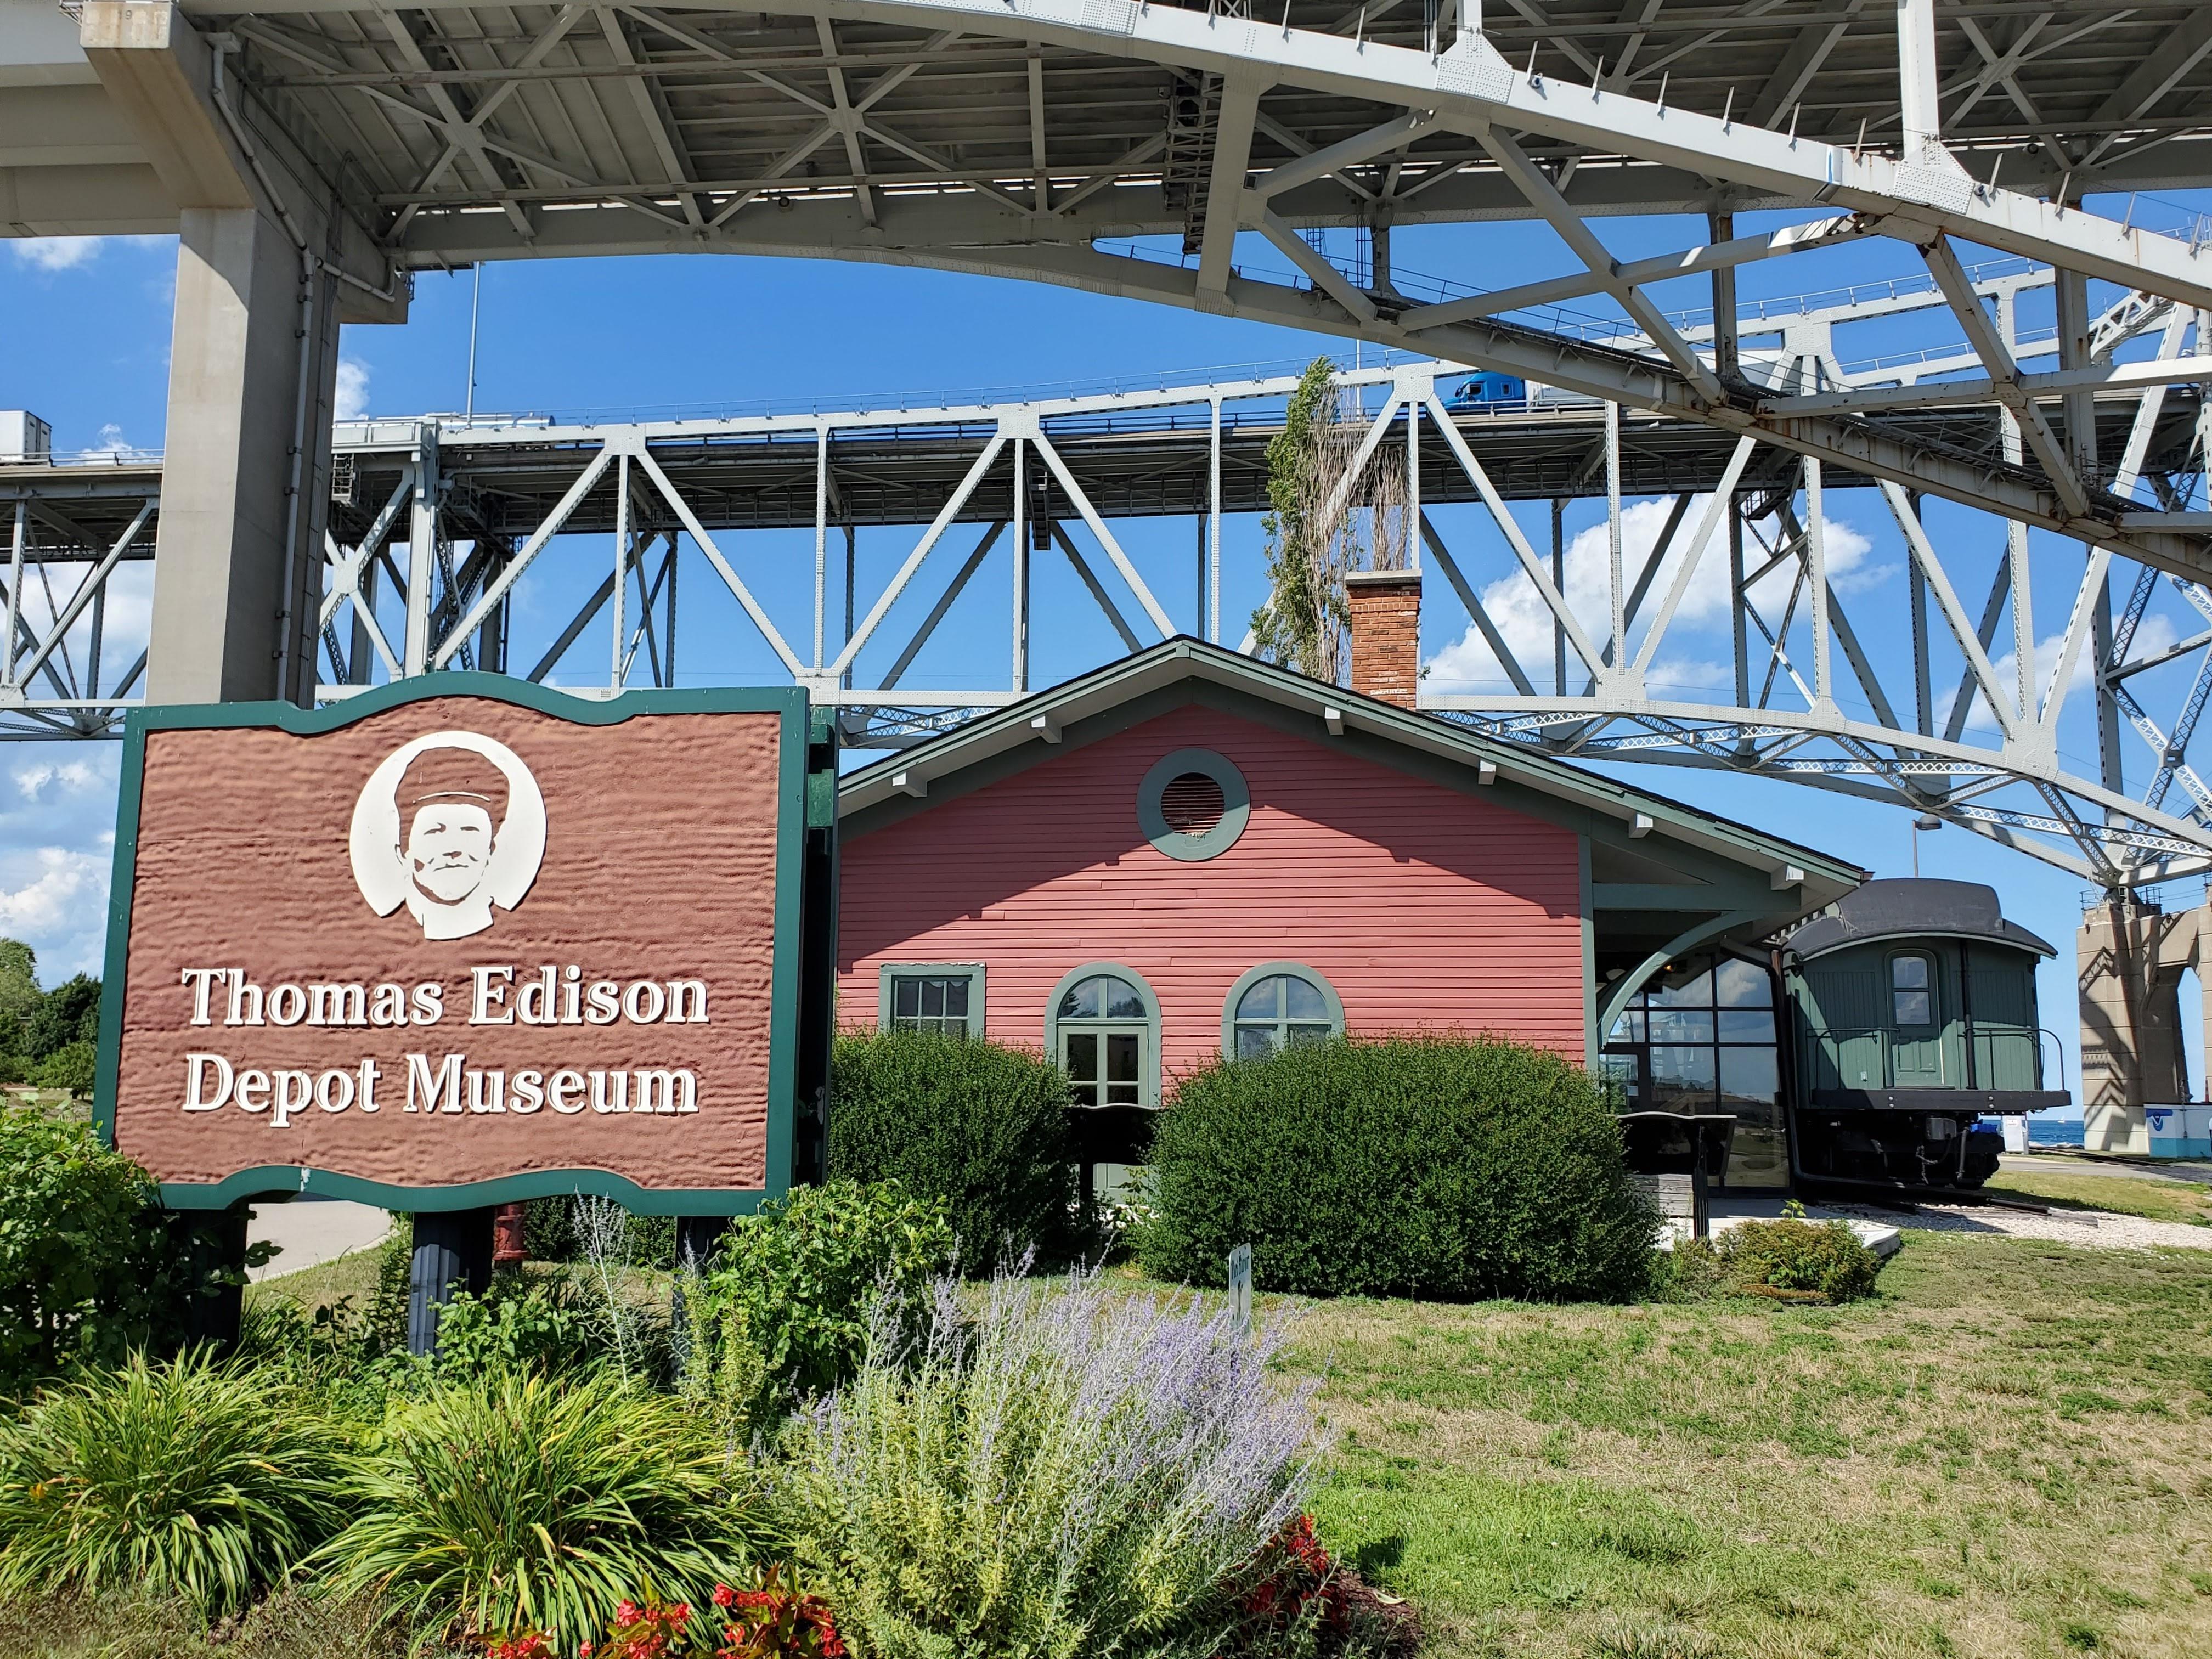 Thomas Edison Museum and Depot